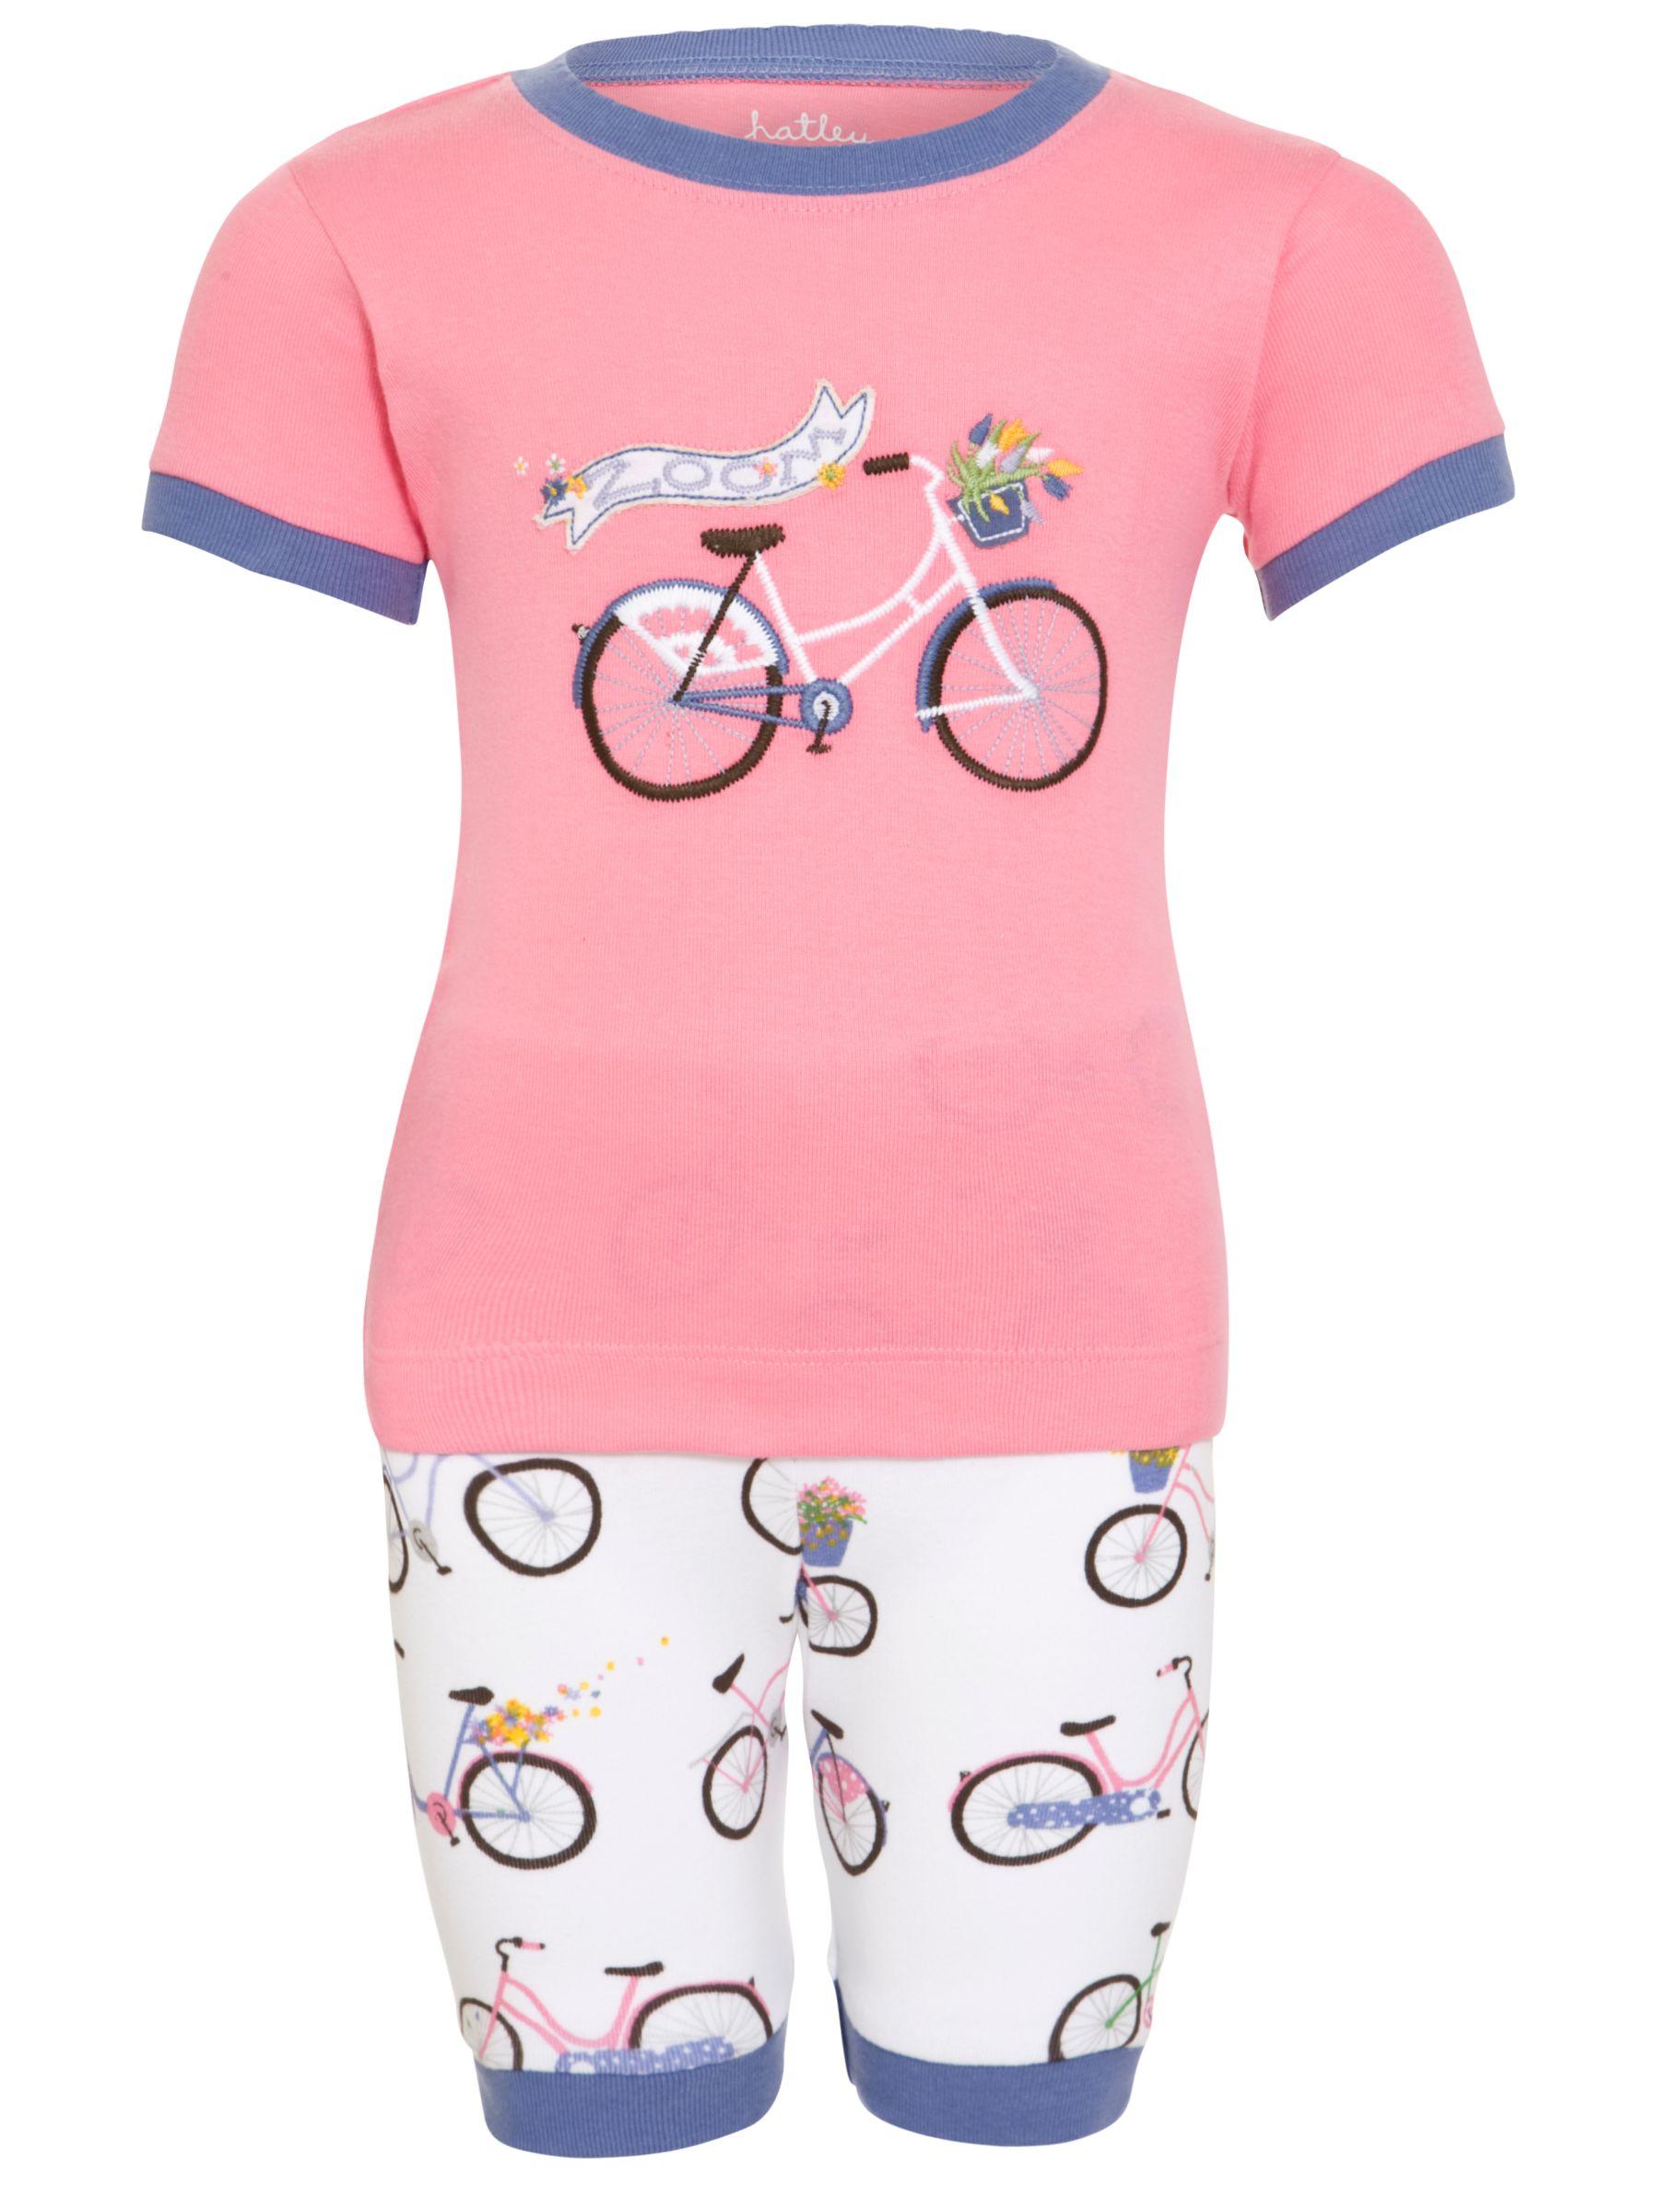 Hatley Bikes Shortie Pyjamas, Pink